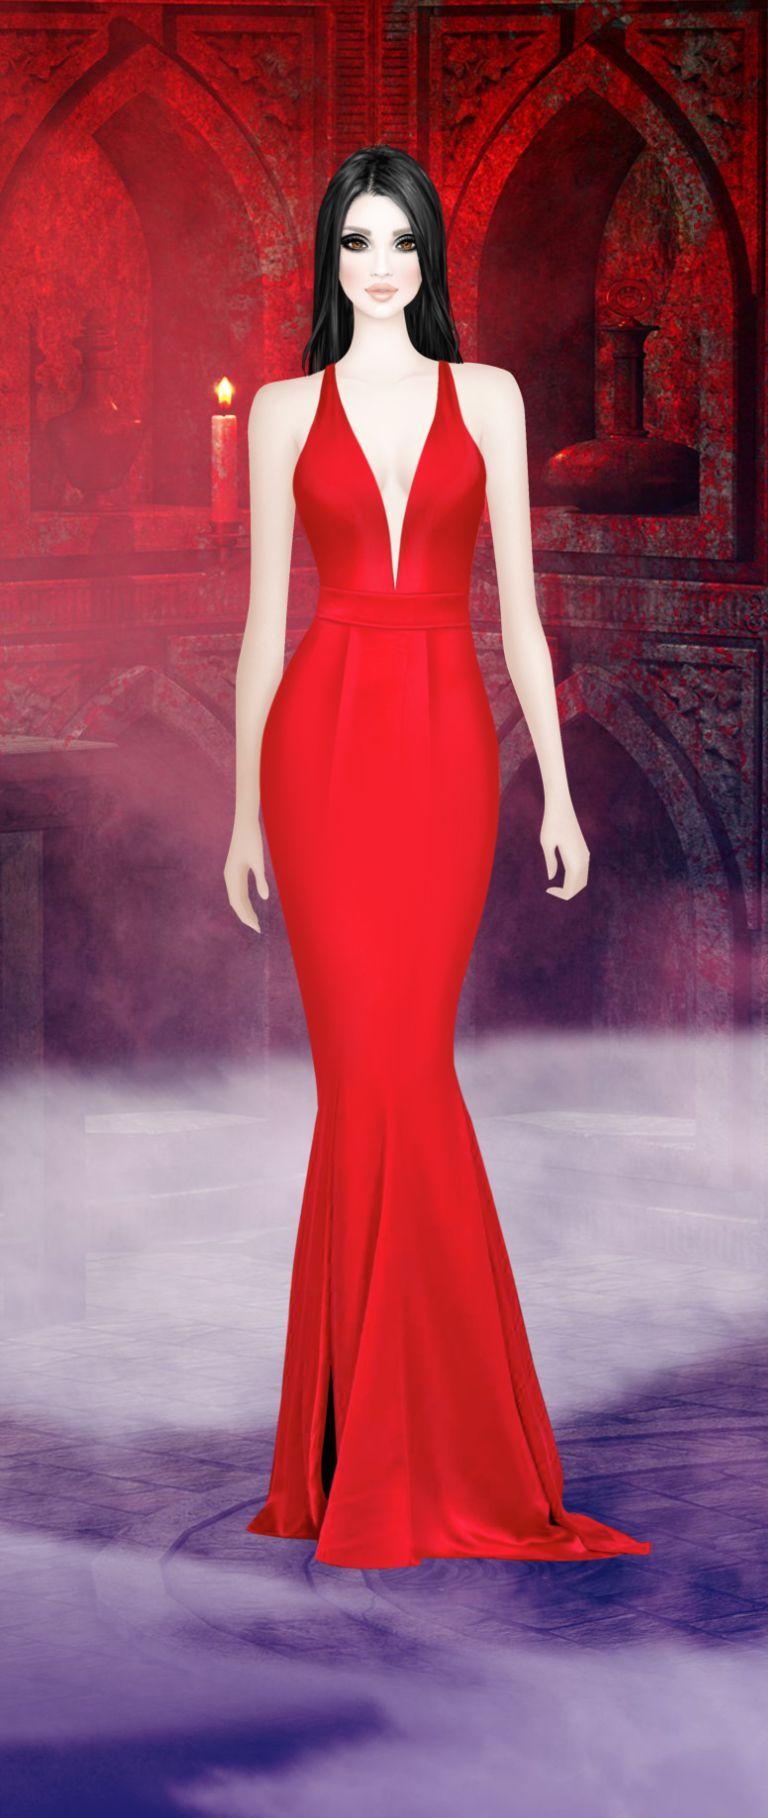 Pin By Jocelynn Alley On Covet Style Fashion Fashion Formal Dresses Dresses